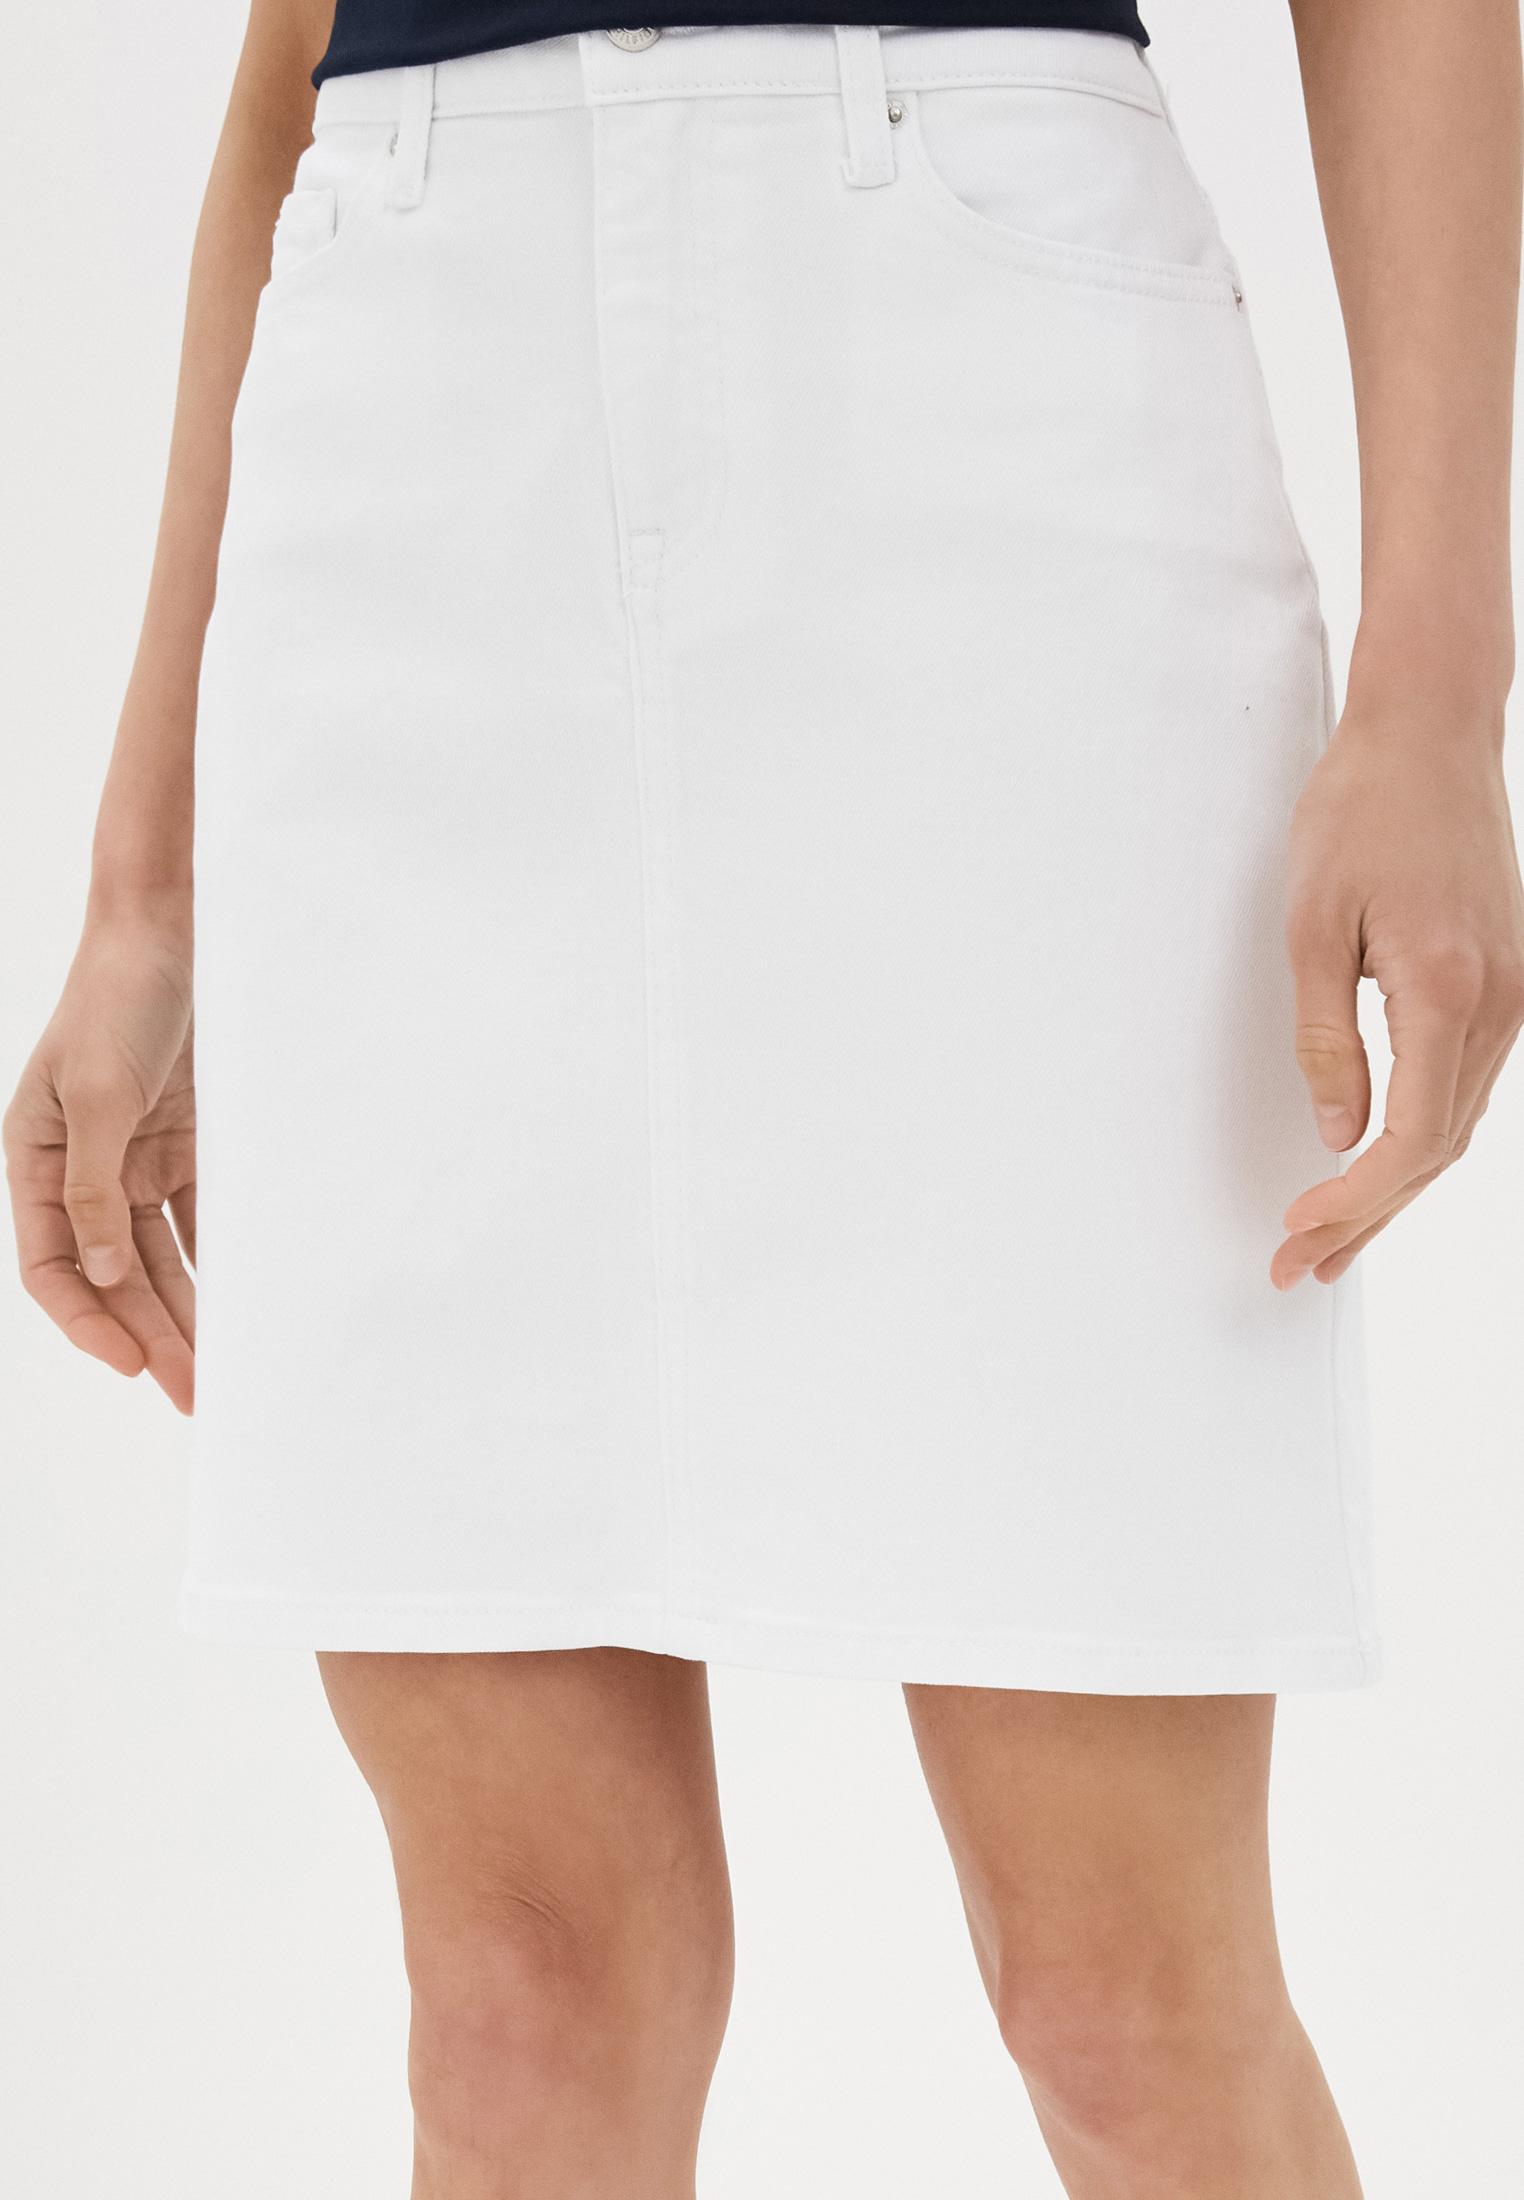 Джинсовая юбка Tommy Hilfiger (Томми Хилфигер) WW0WW27356